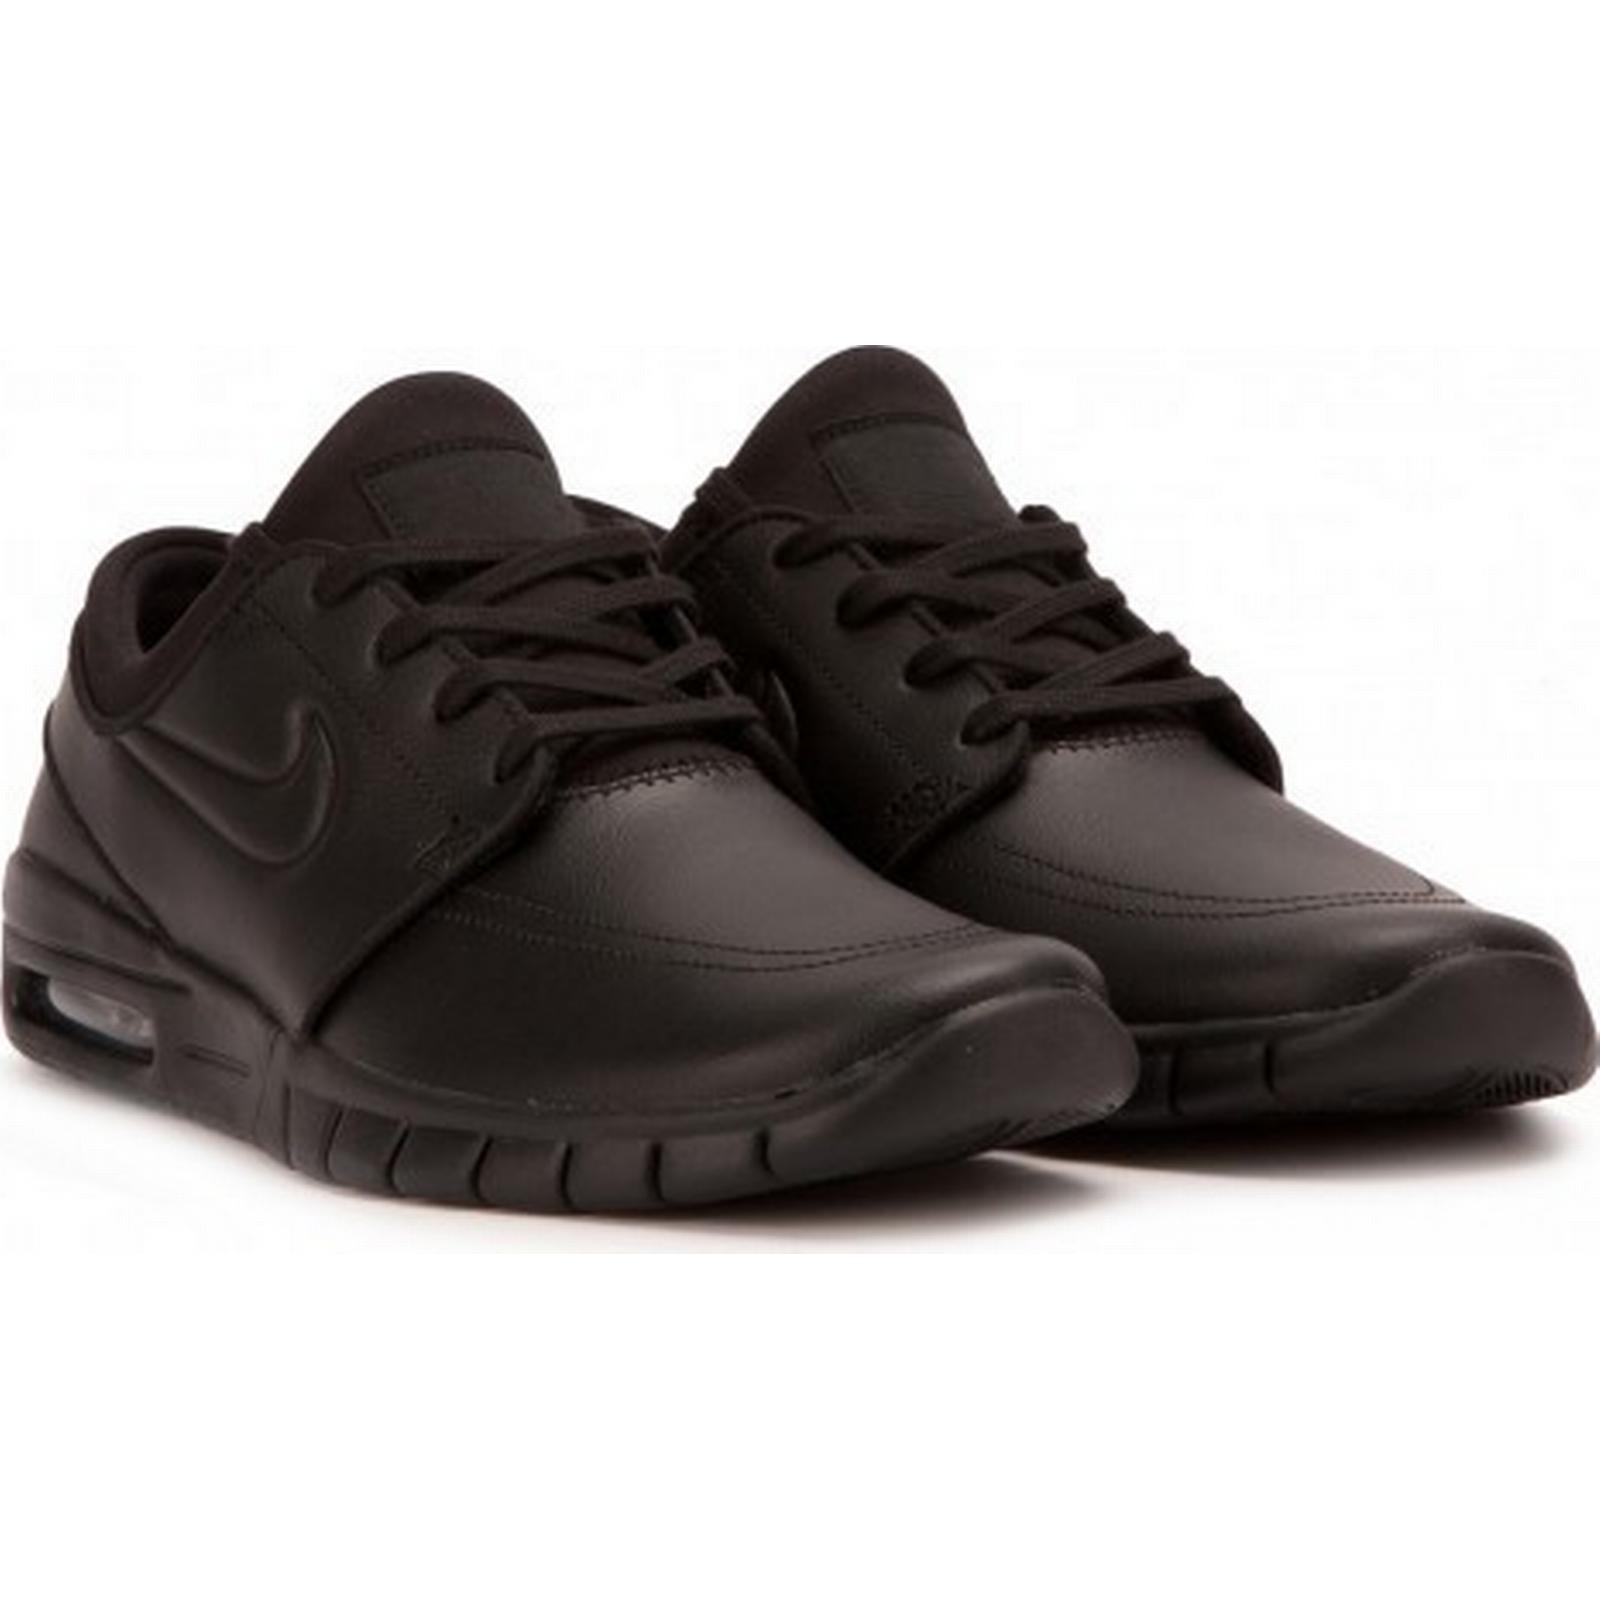 Nike Leather SB Stefan Janoski Max Leather Nike (Black) e6f12e